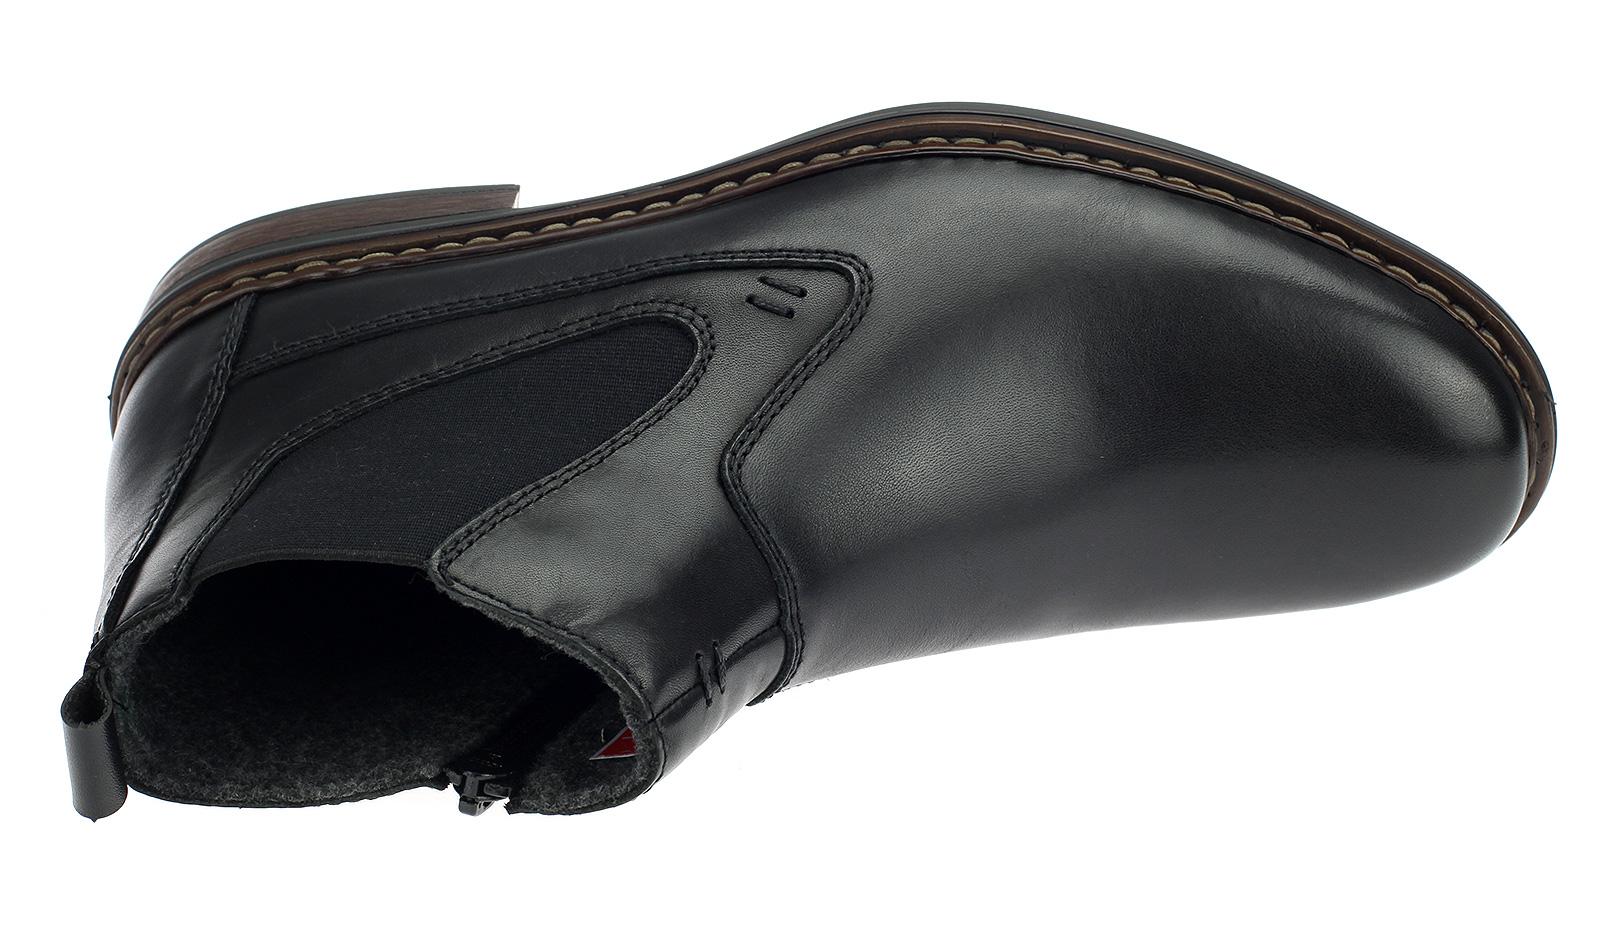 Rieker Herren Stiefel Boots Gefüttert